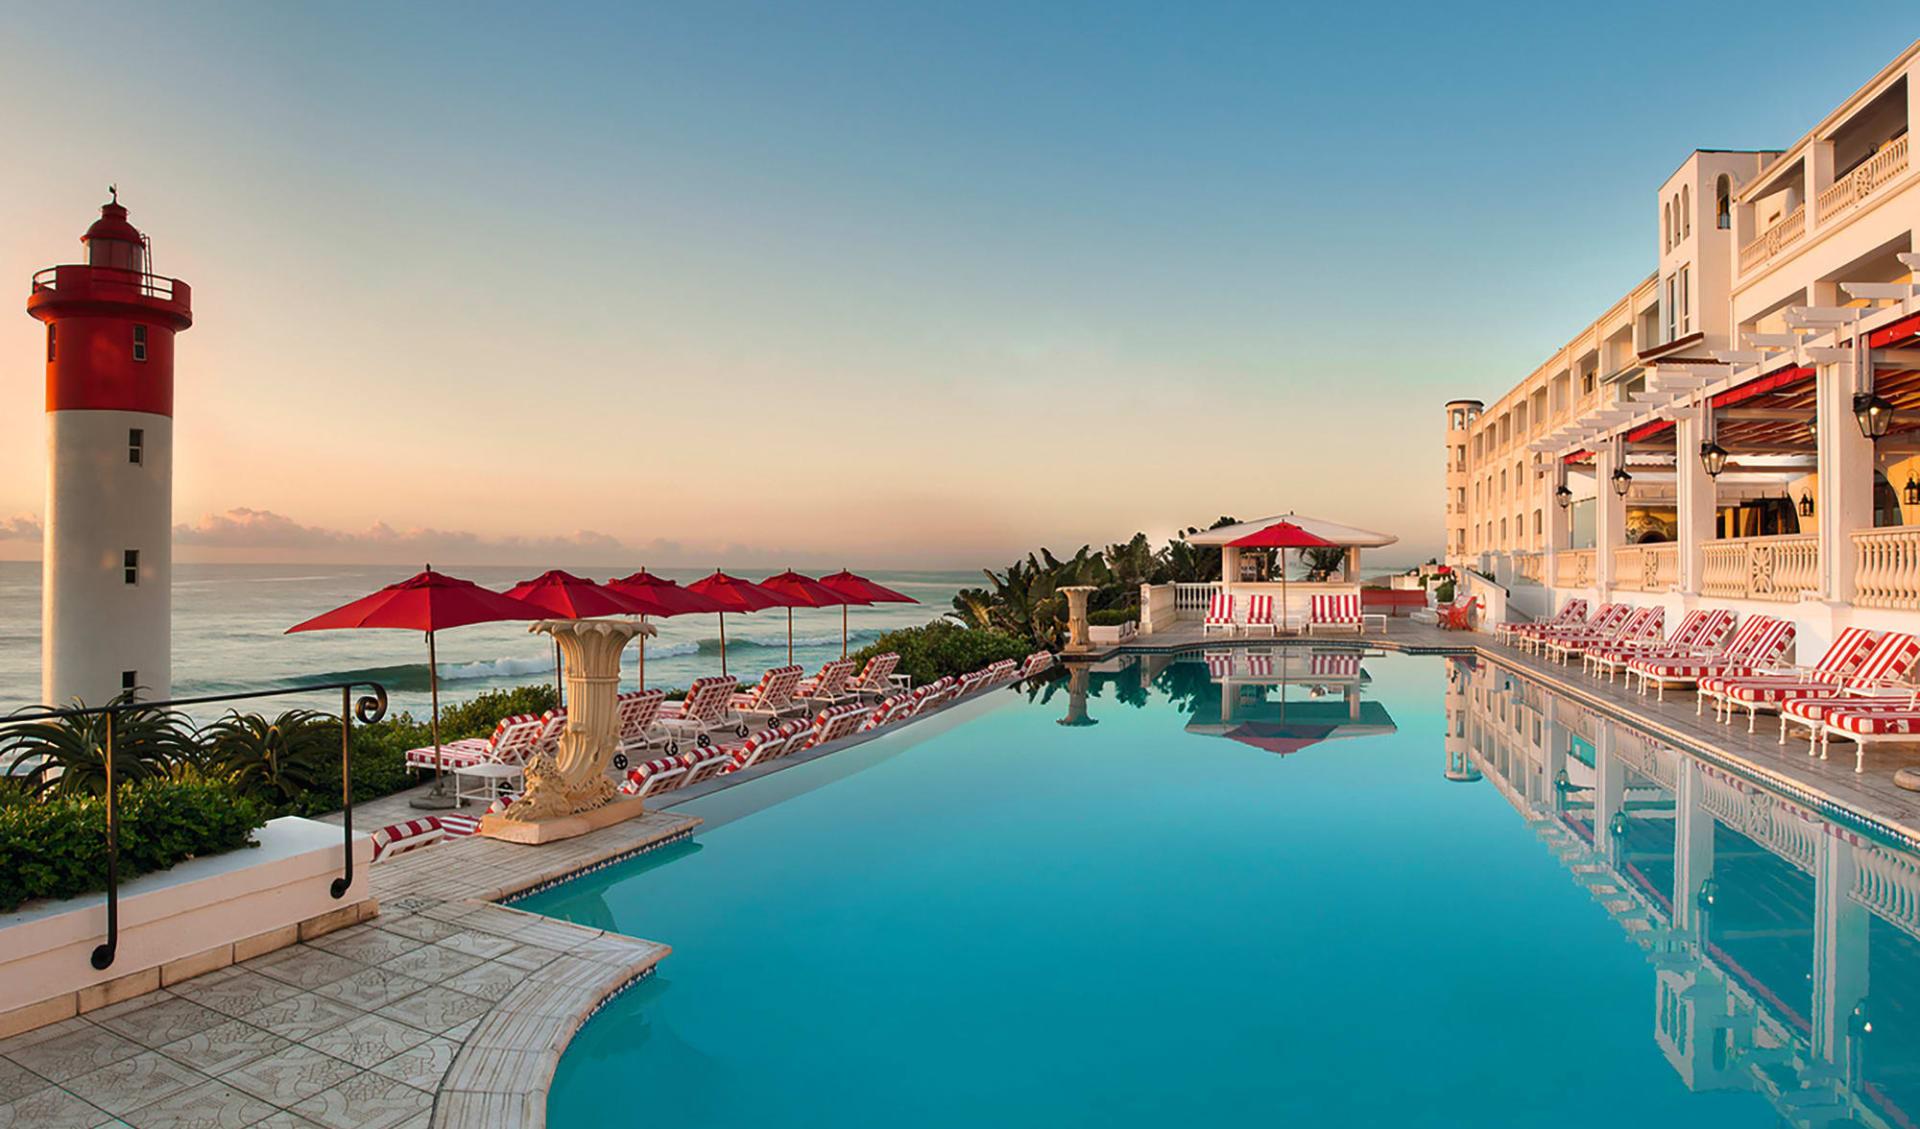 Wonders of South Africa ab Kapstadt: exterior: The Oyster Box Hotel - Oceanpool und Aussenfassade